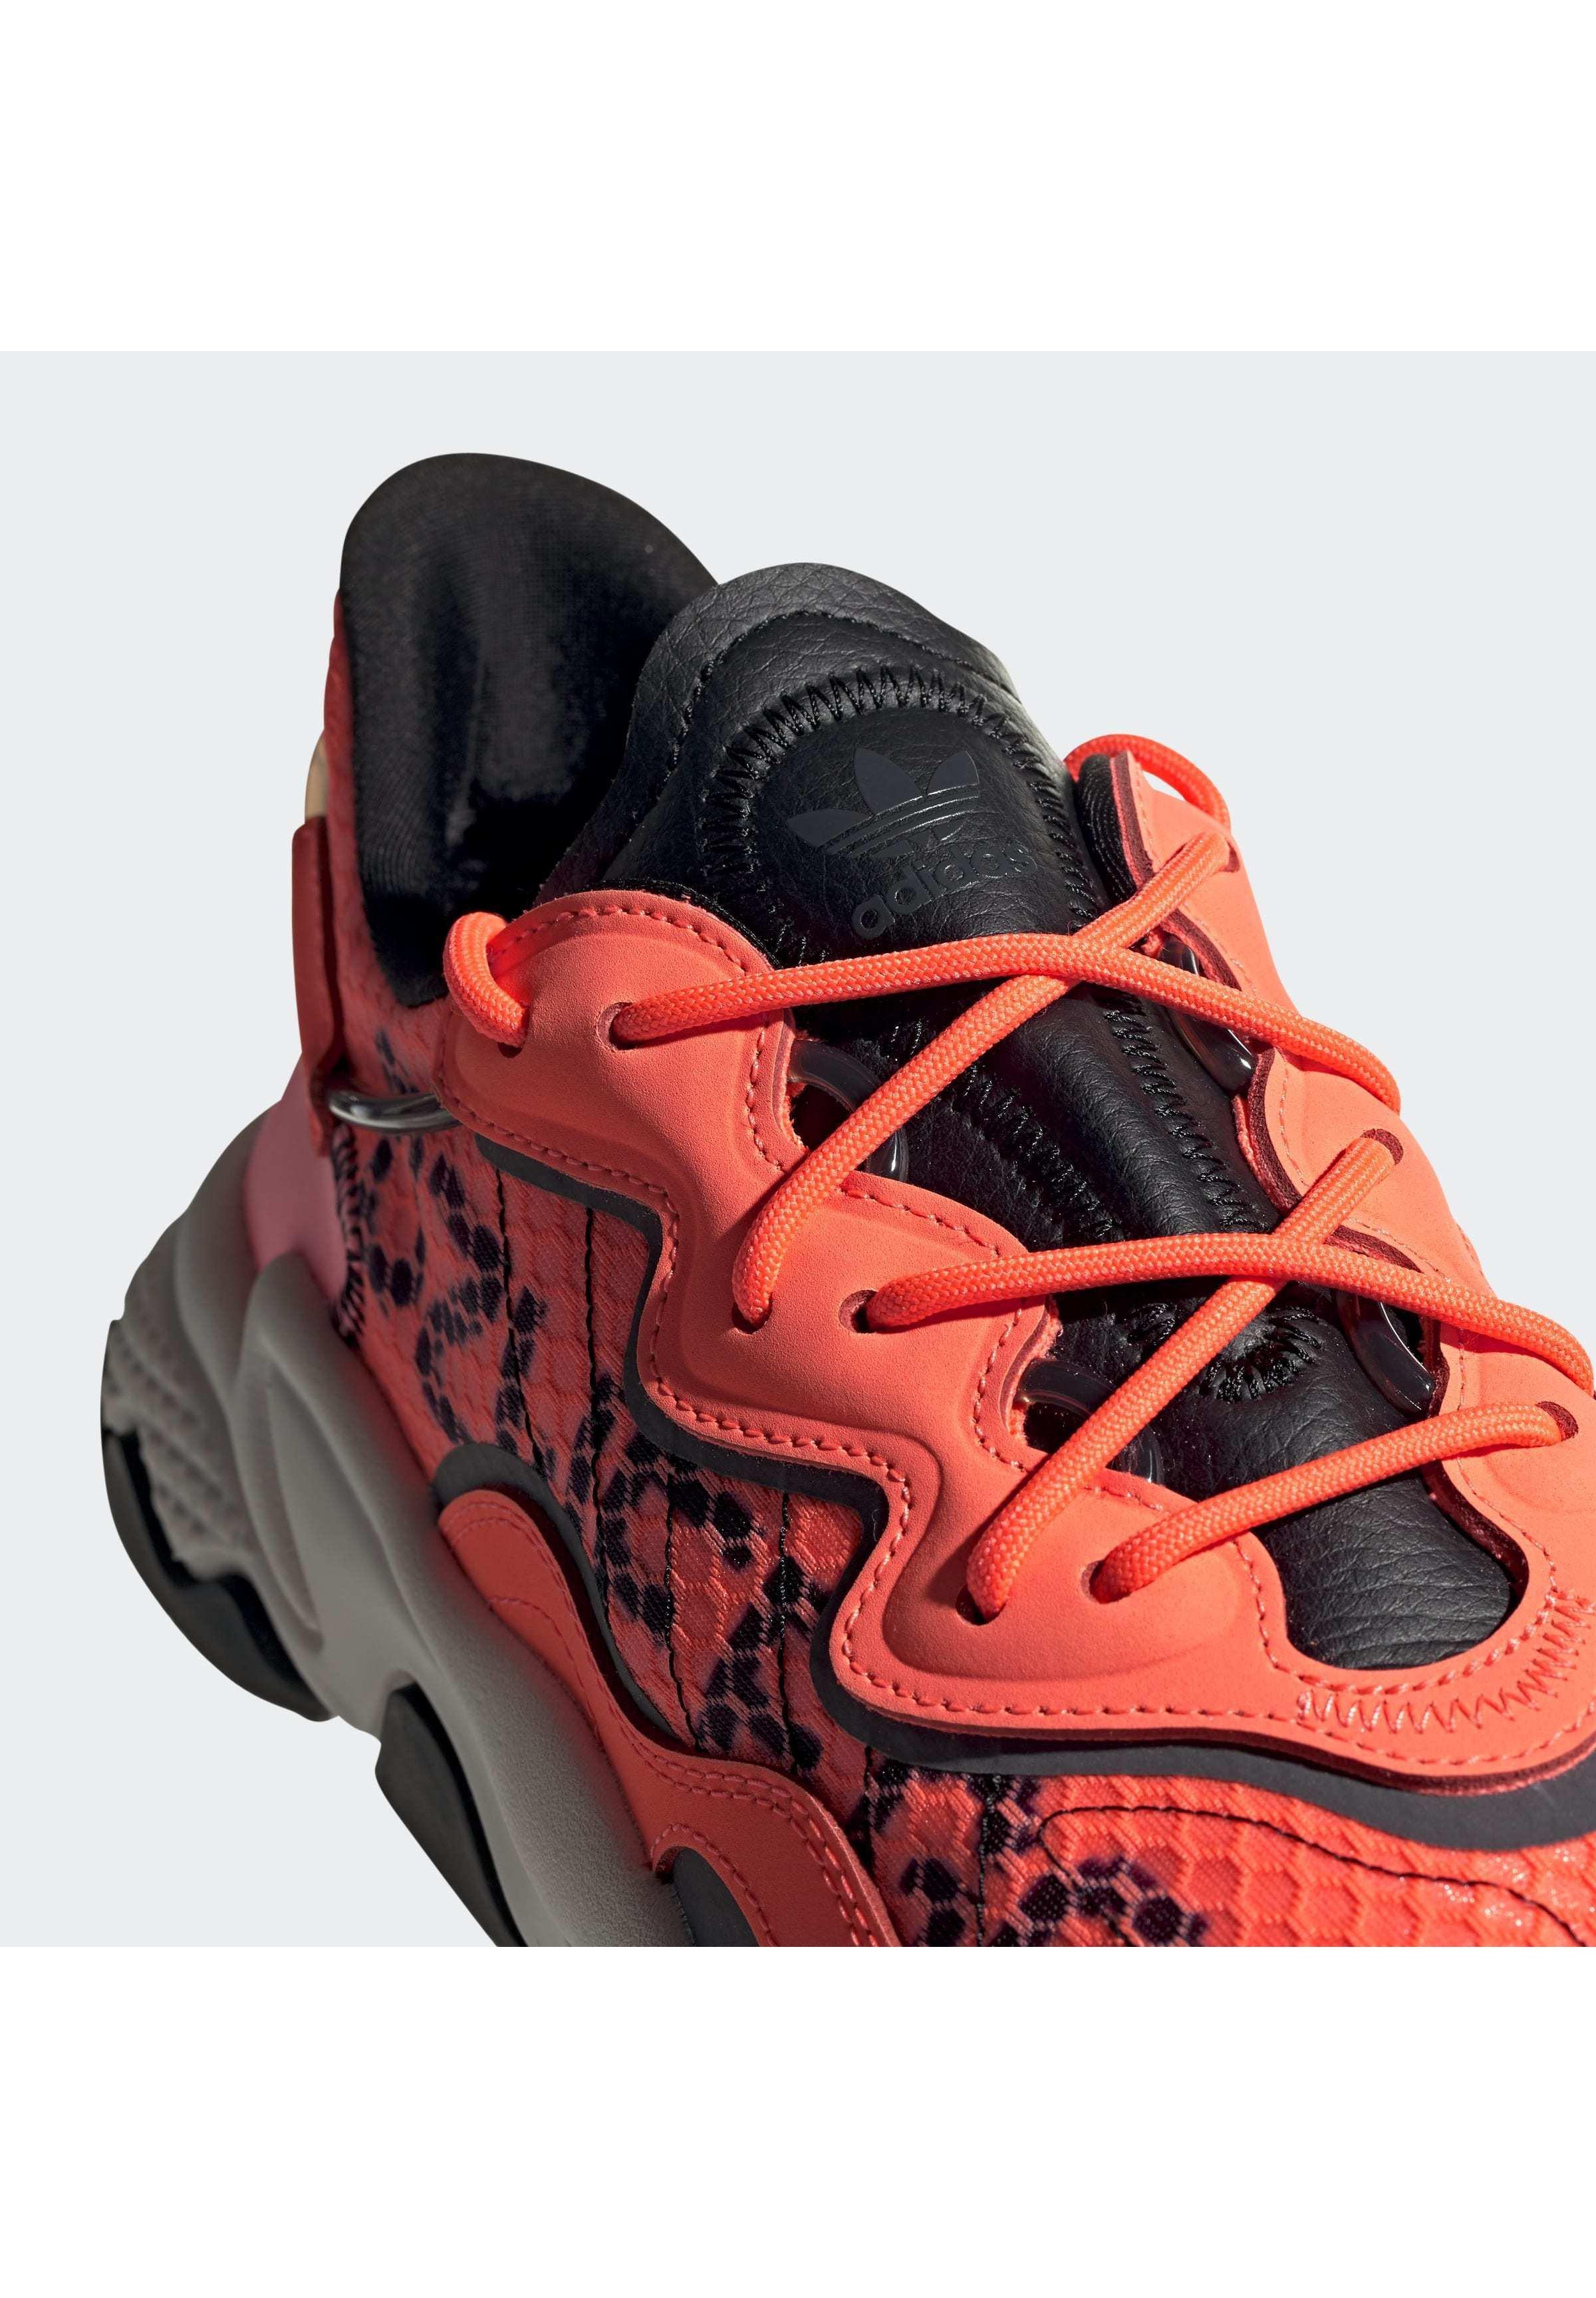 adidas Originals OZWEEGO SHOES - Sneaker low - orange - Herrenschuhe FGMig